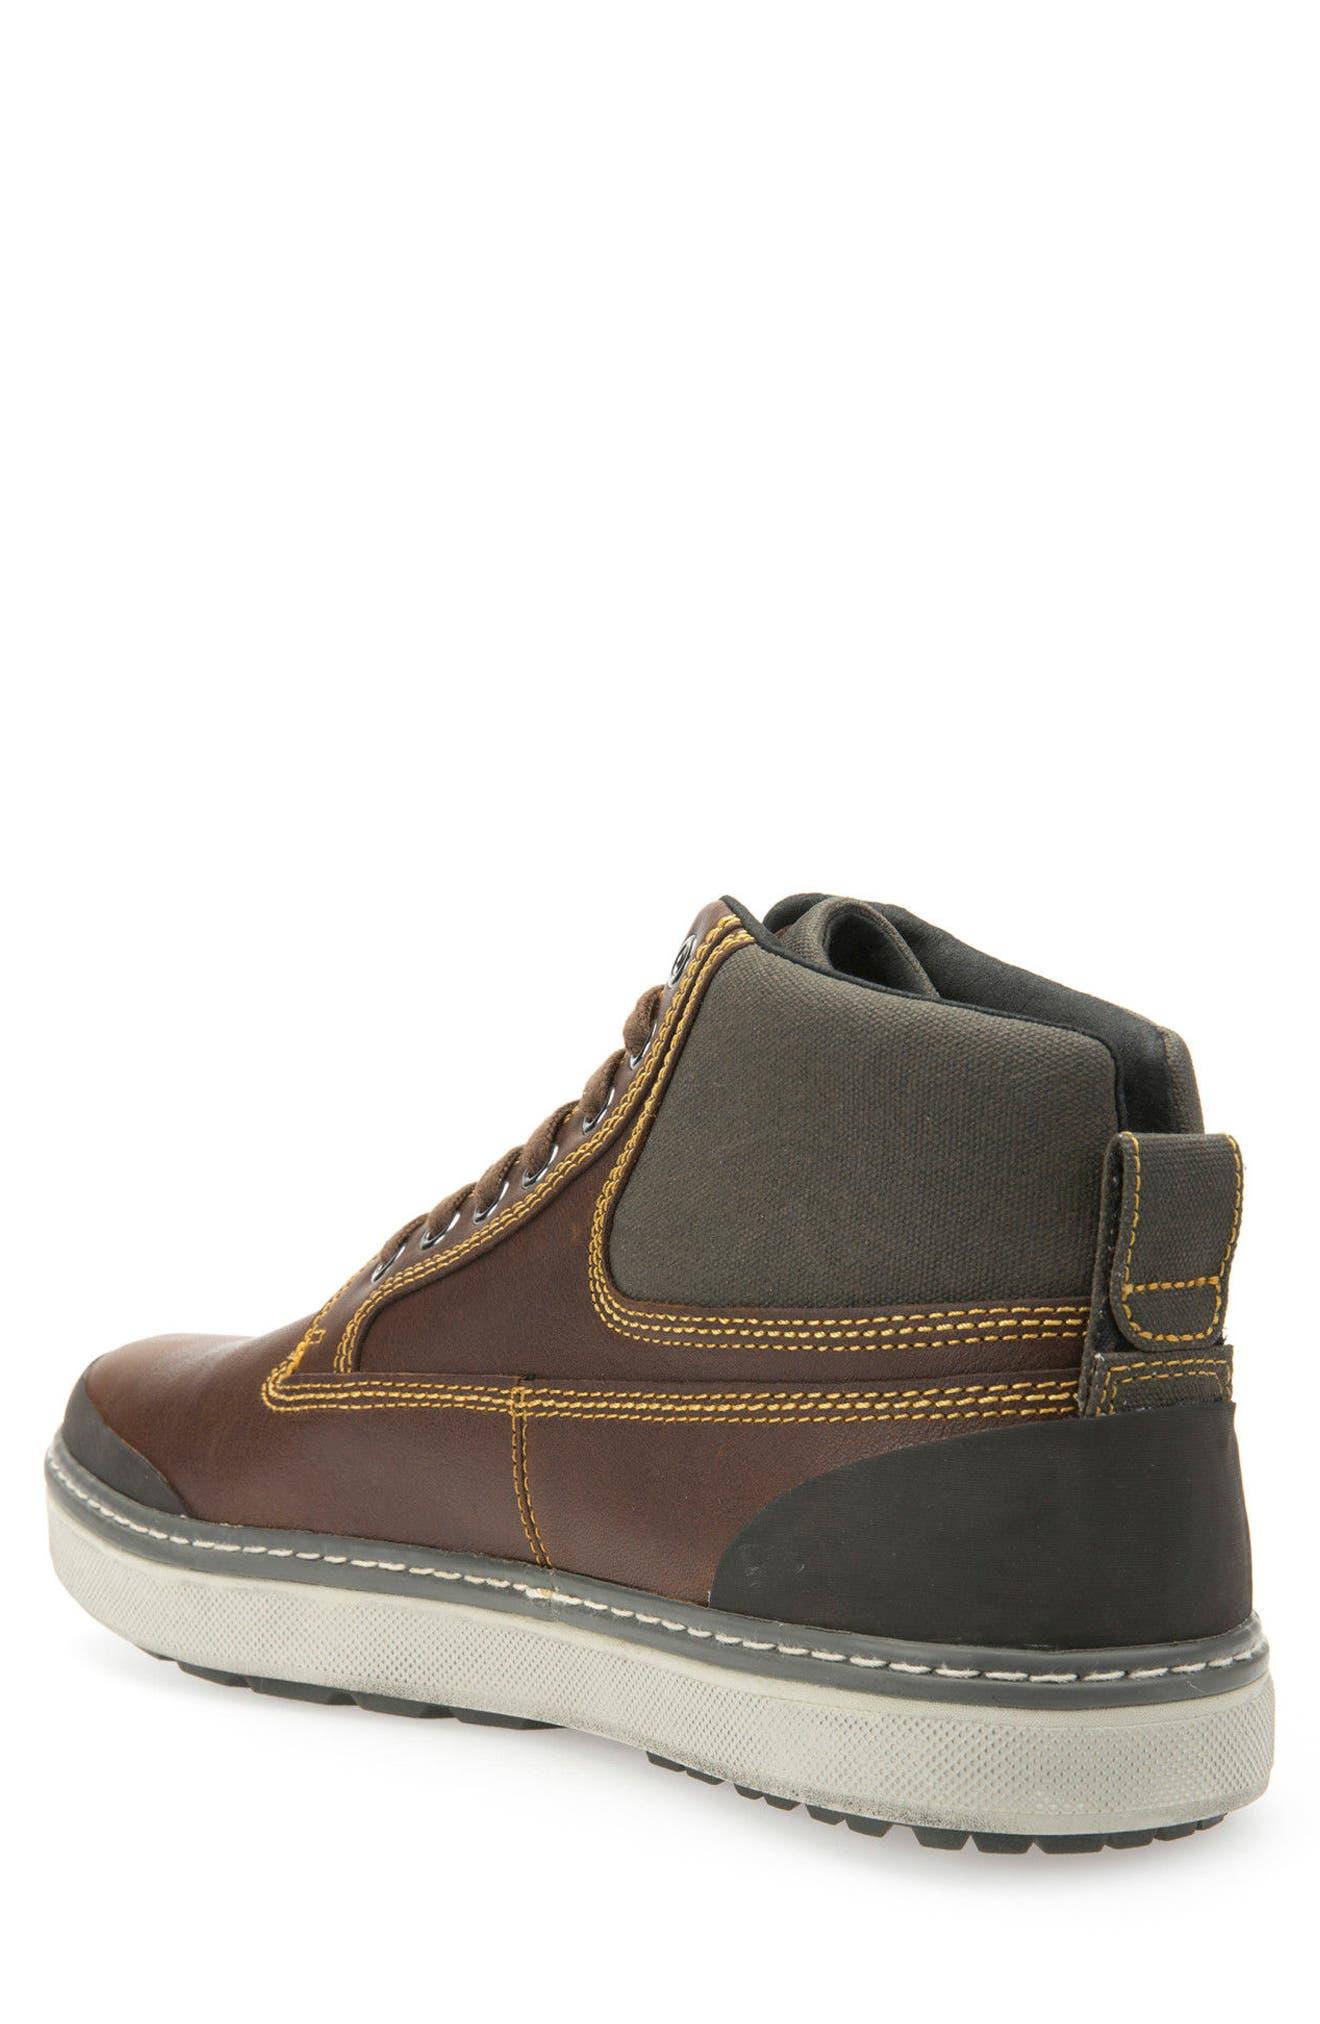 Mattias Amphibiox Waterproof Leather Sneaker,                             Alternate thumbnail 2, color,                             Brown/ Brown